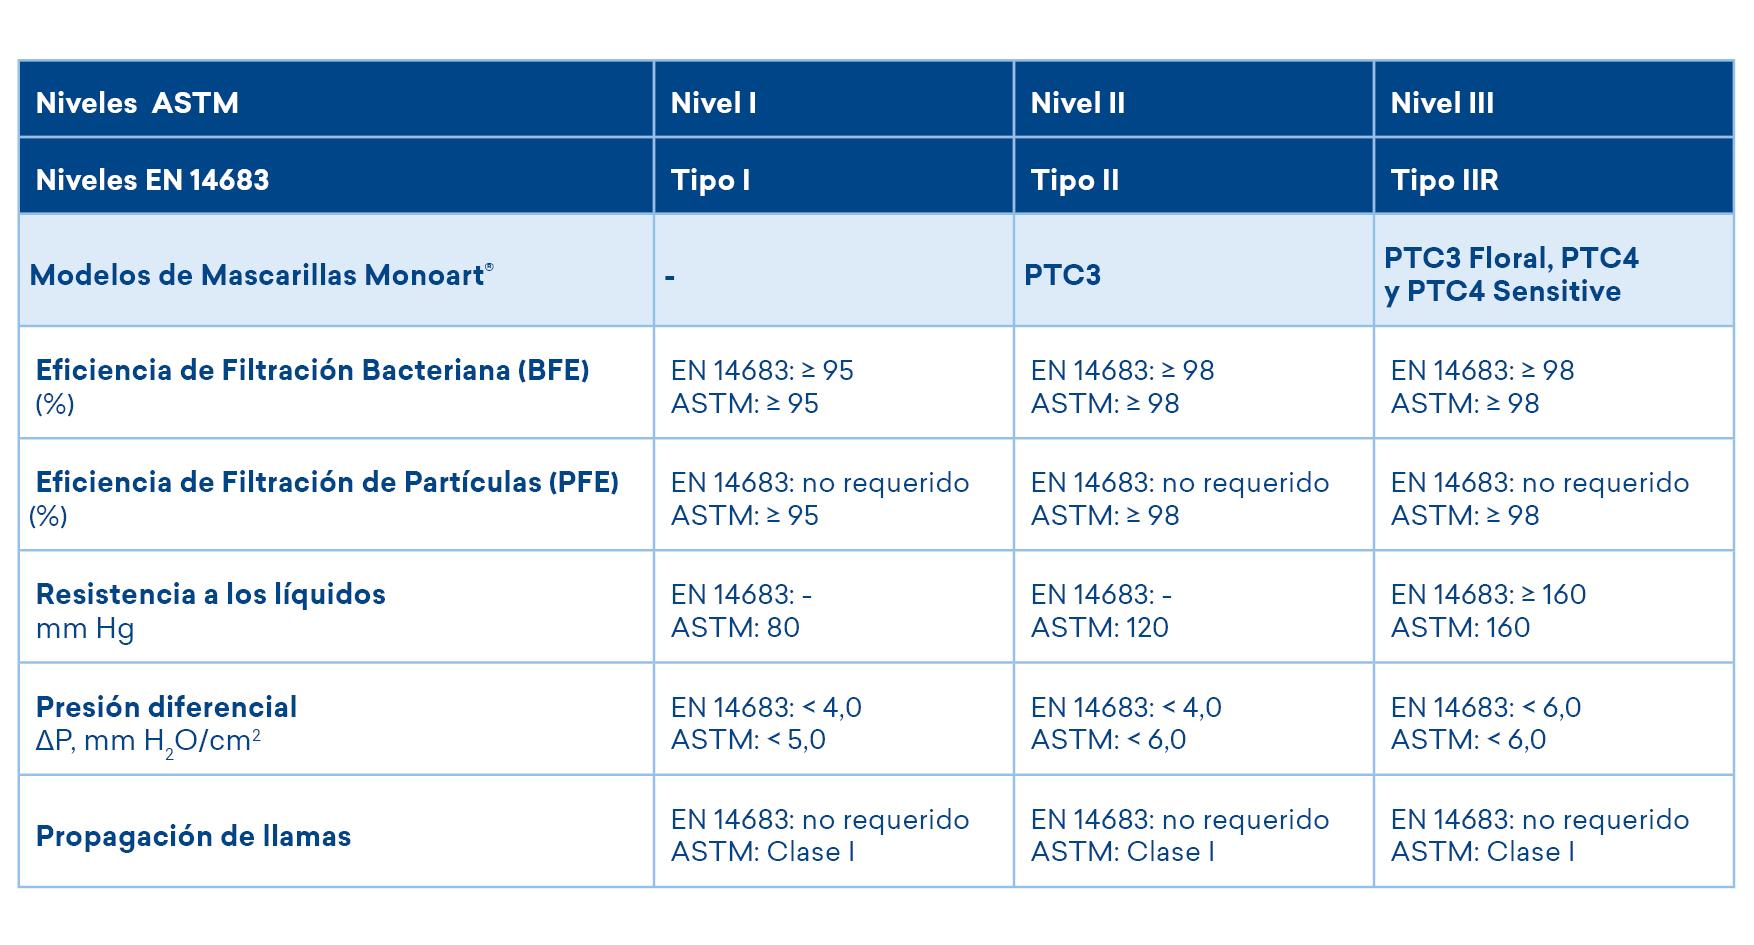 Niveles ASTM Niveles EN 14683